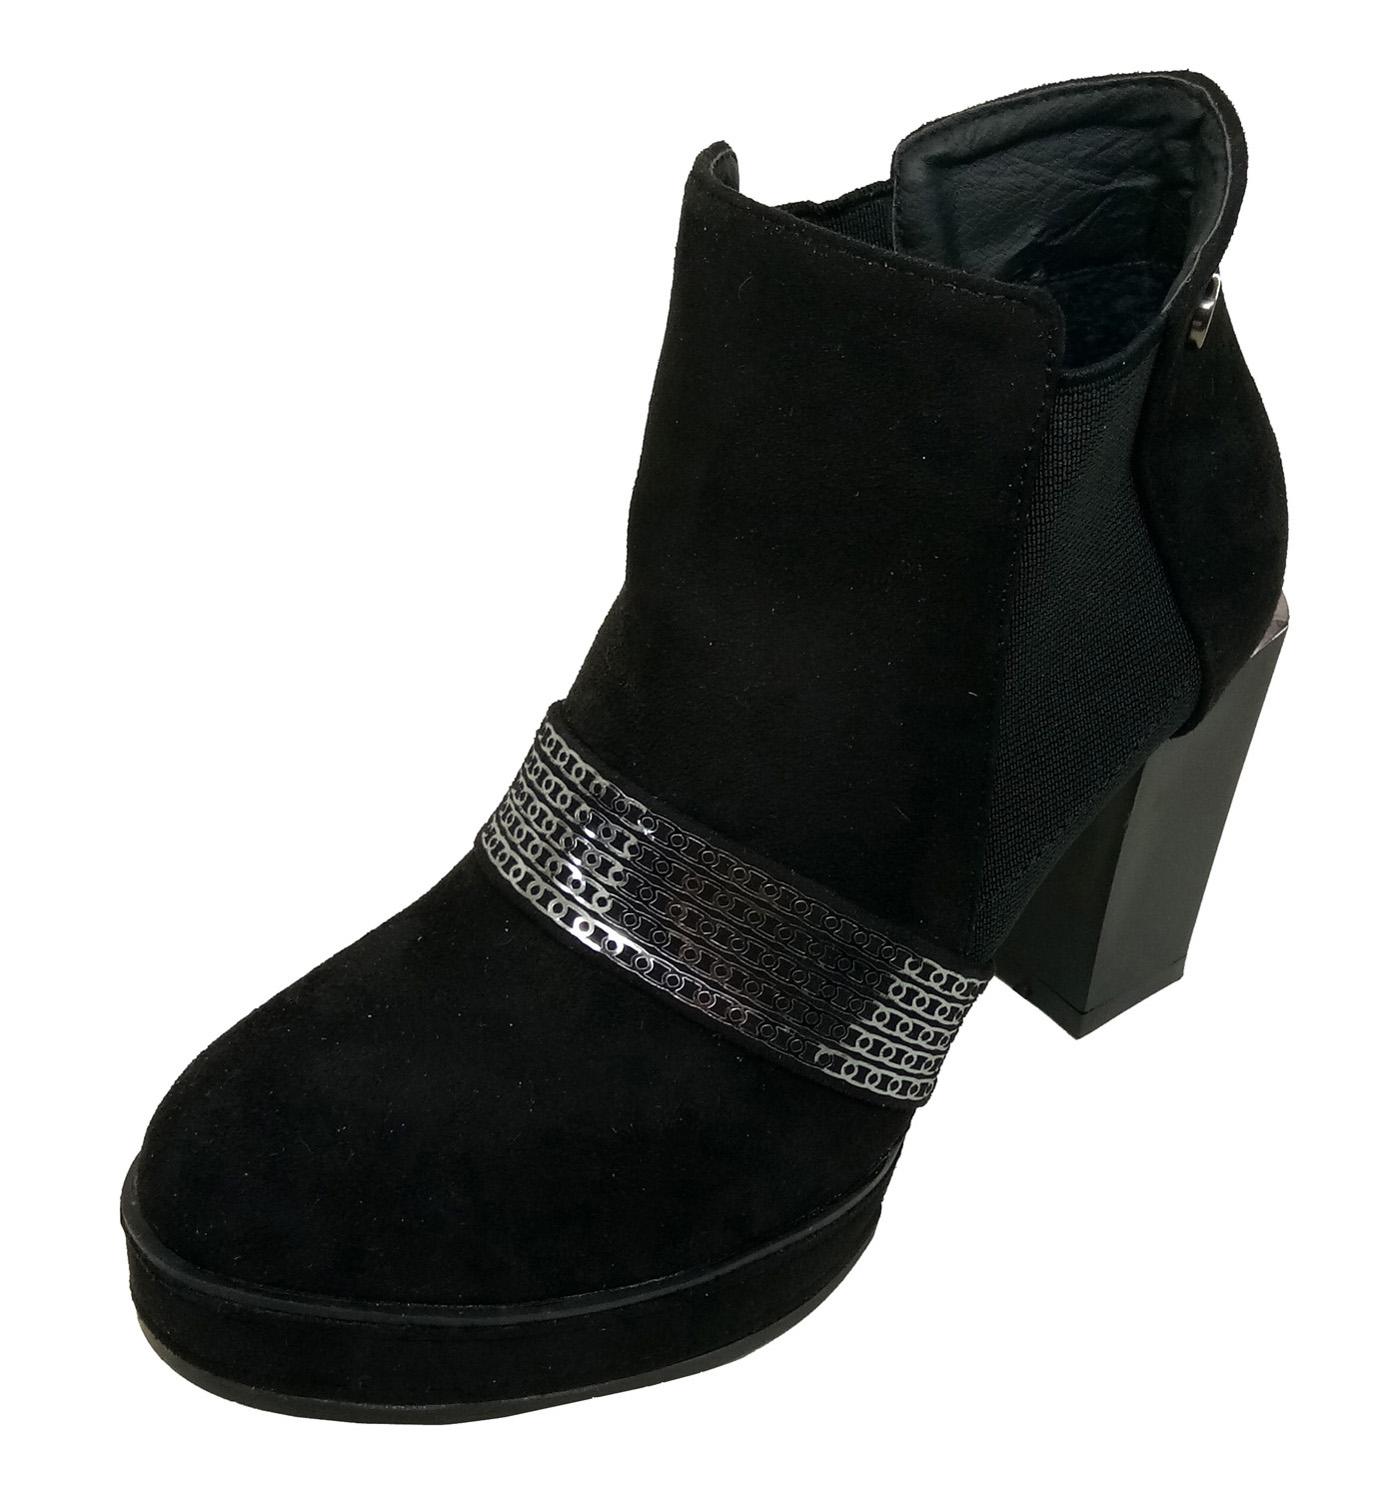 hienbuy Women Casual Heeled Boots